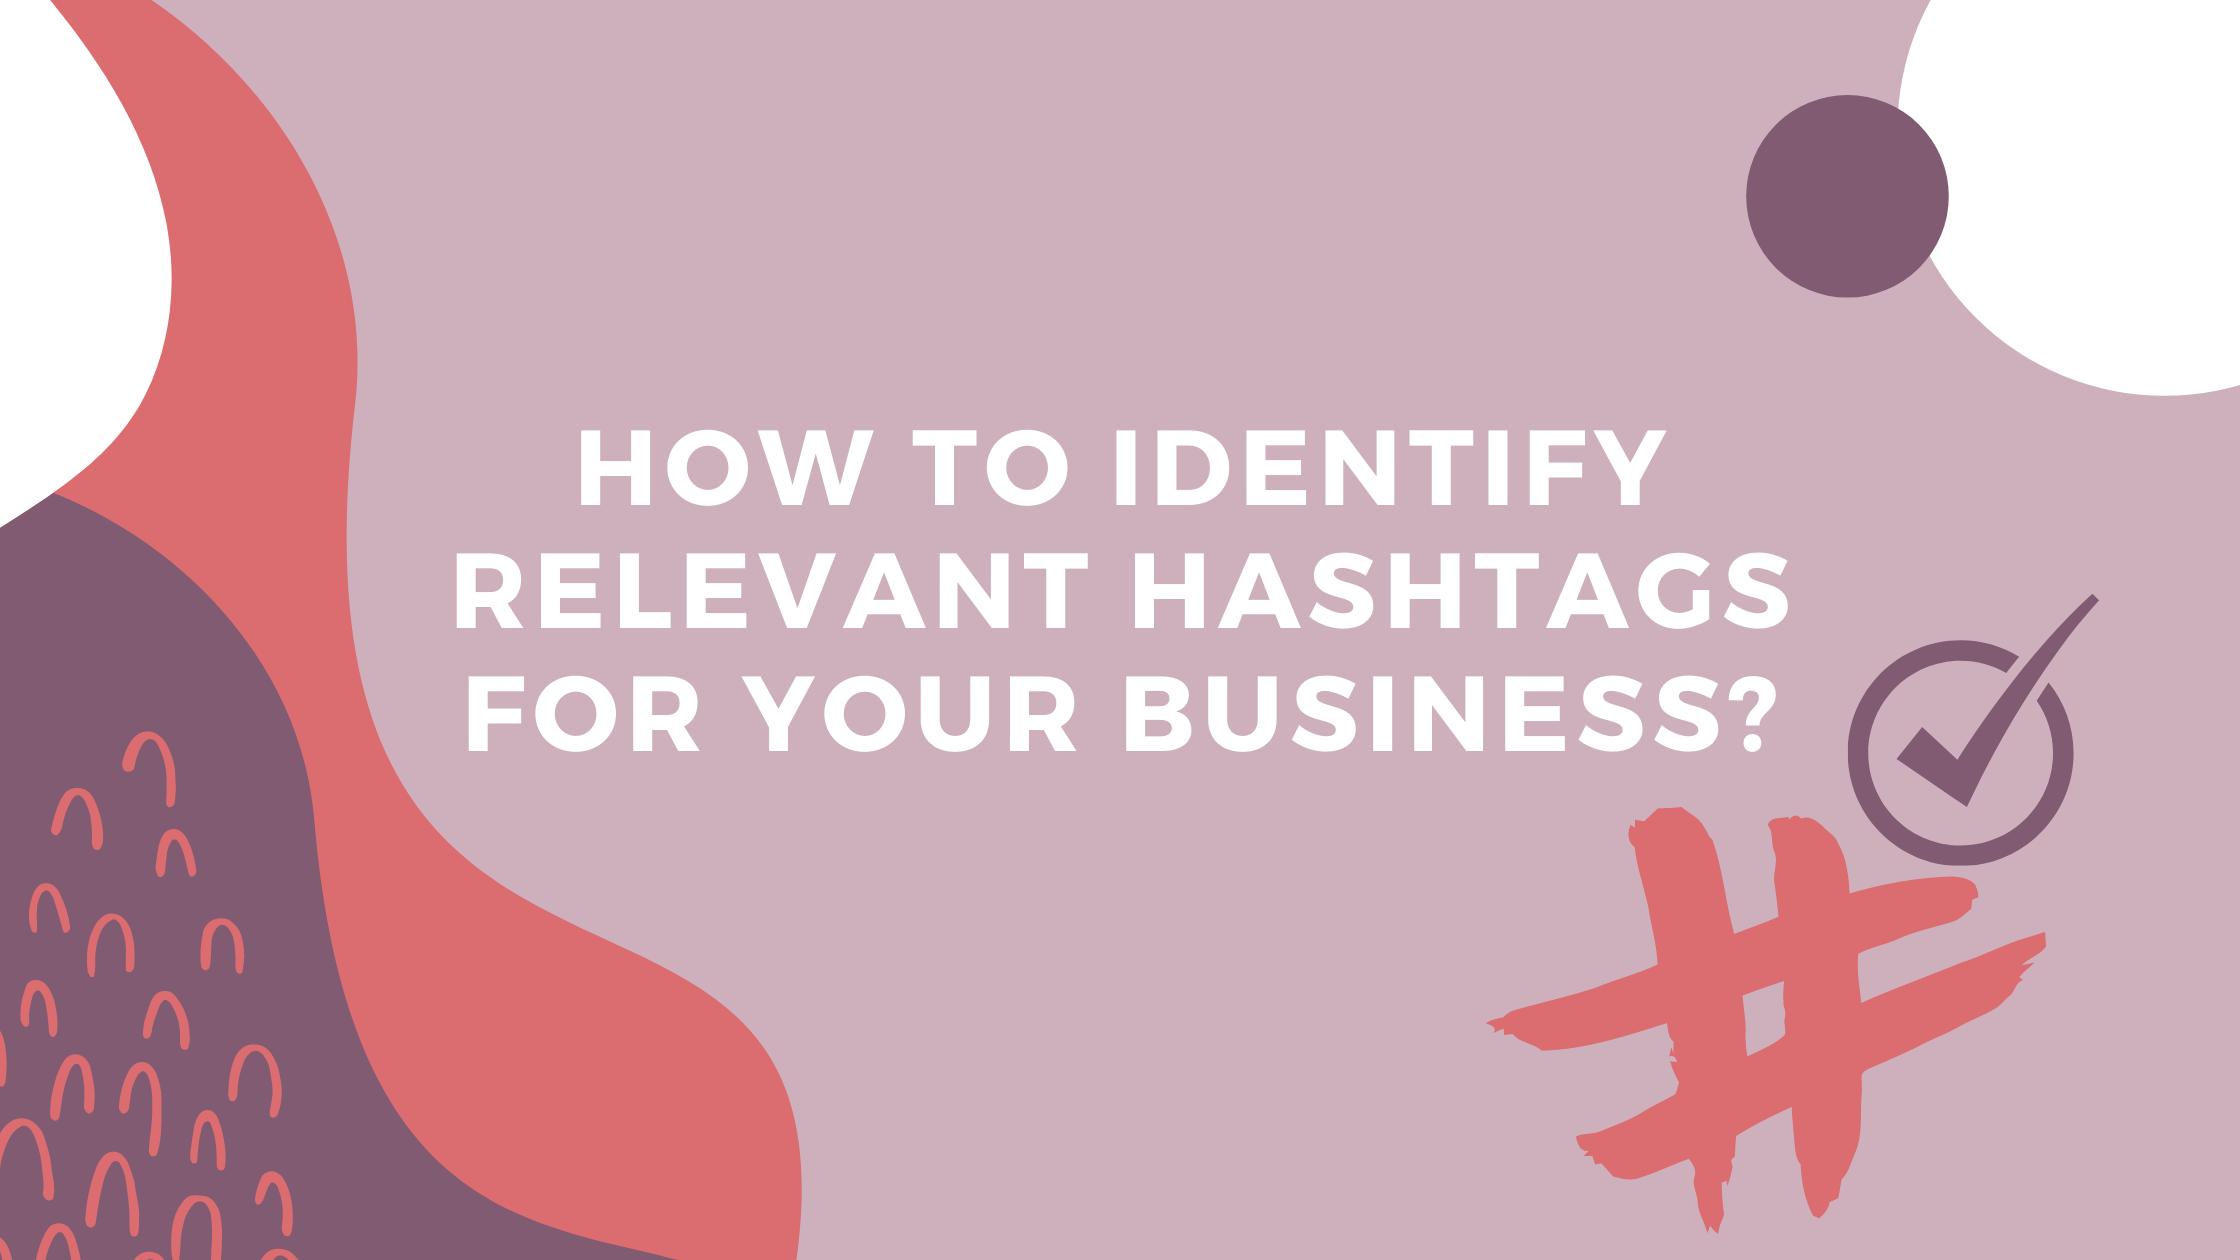 relevant hashtags